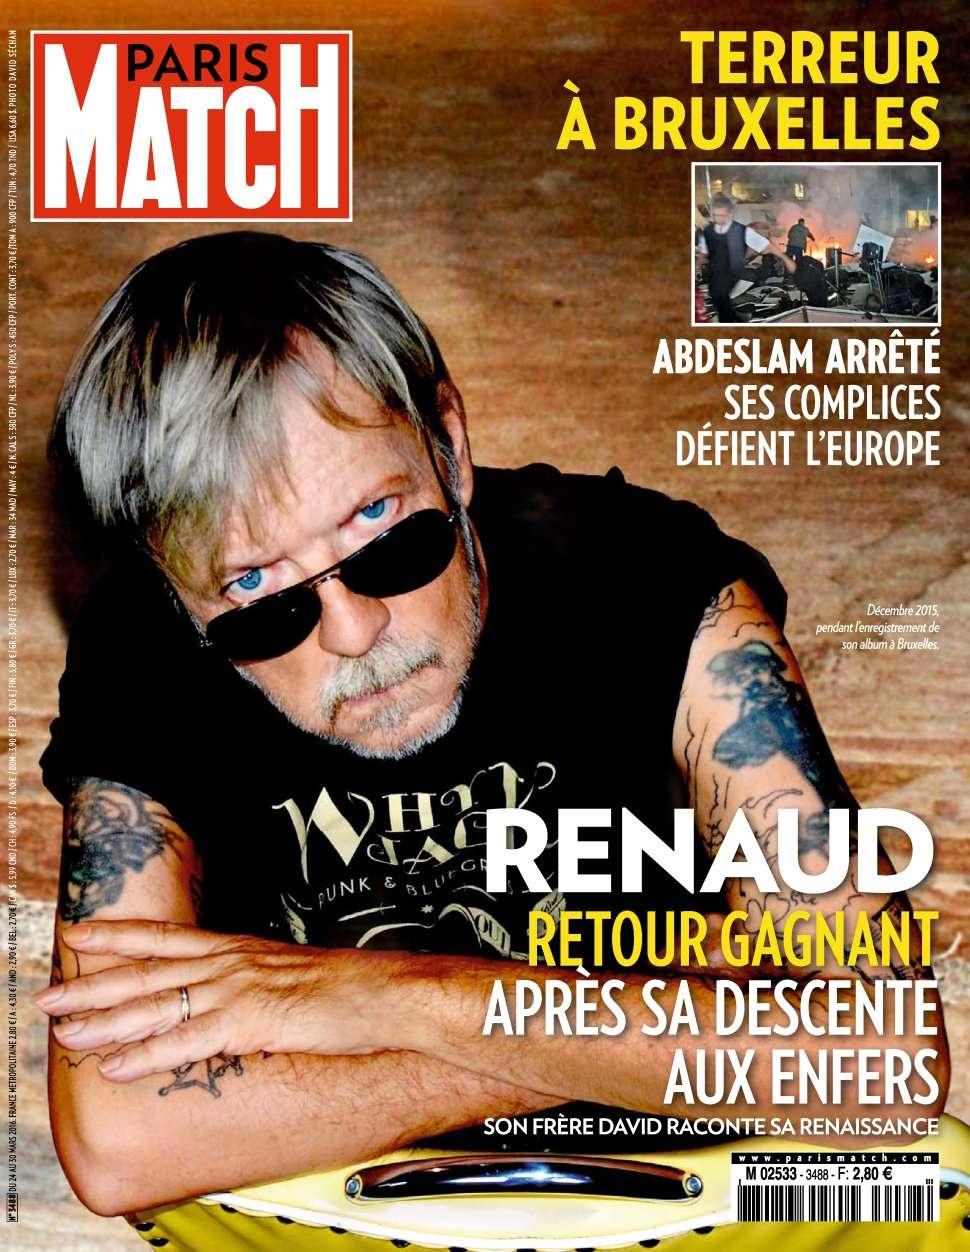 Paris Match 3488 - 24 au 30 Mars 2016